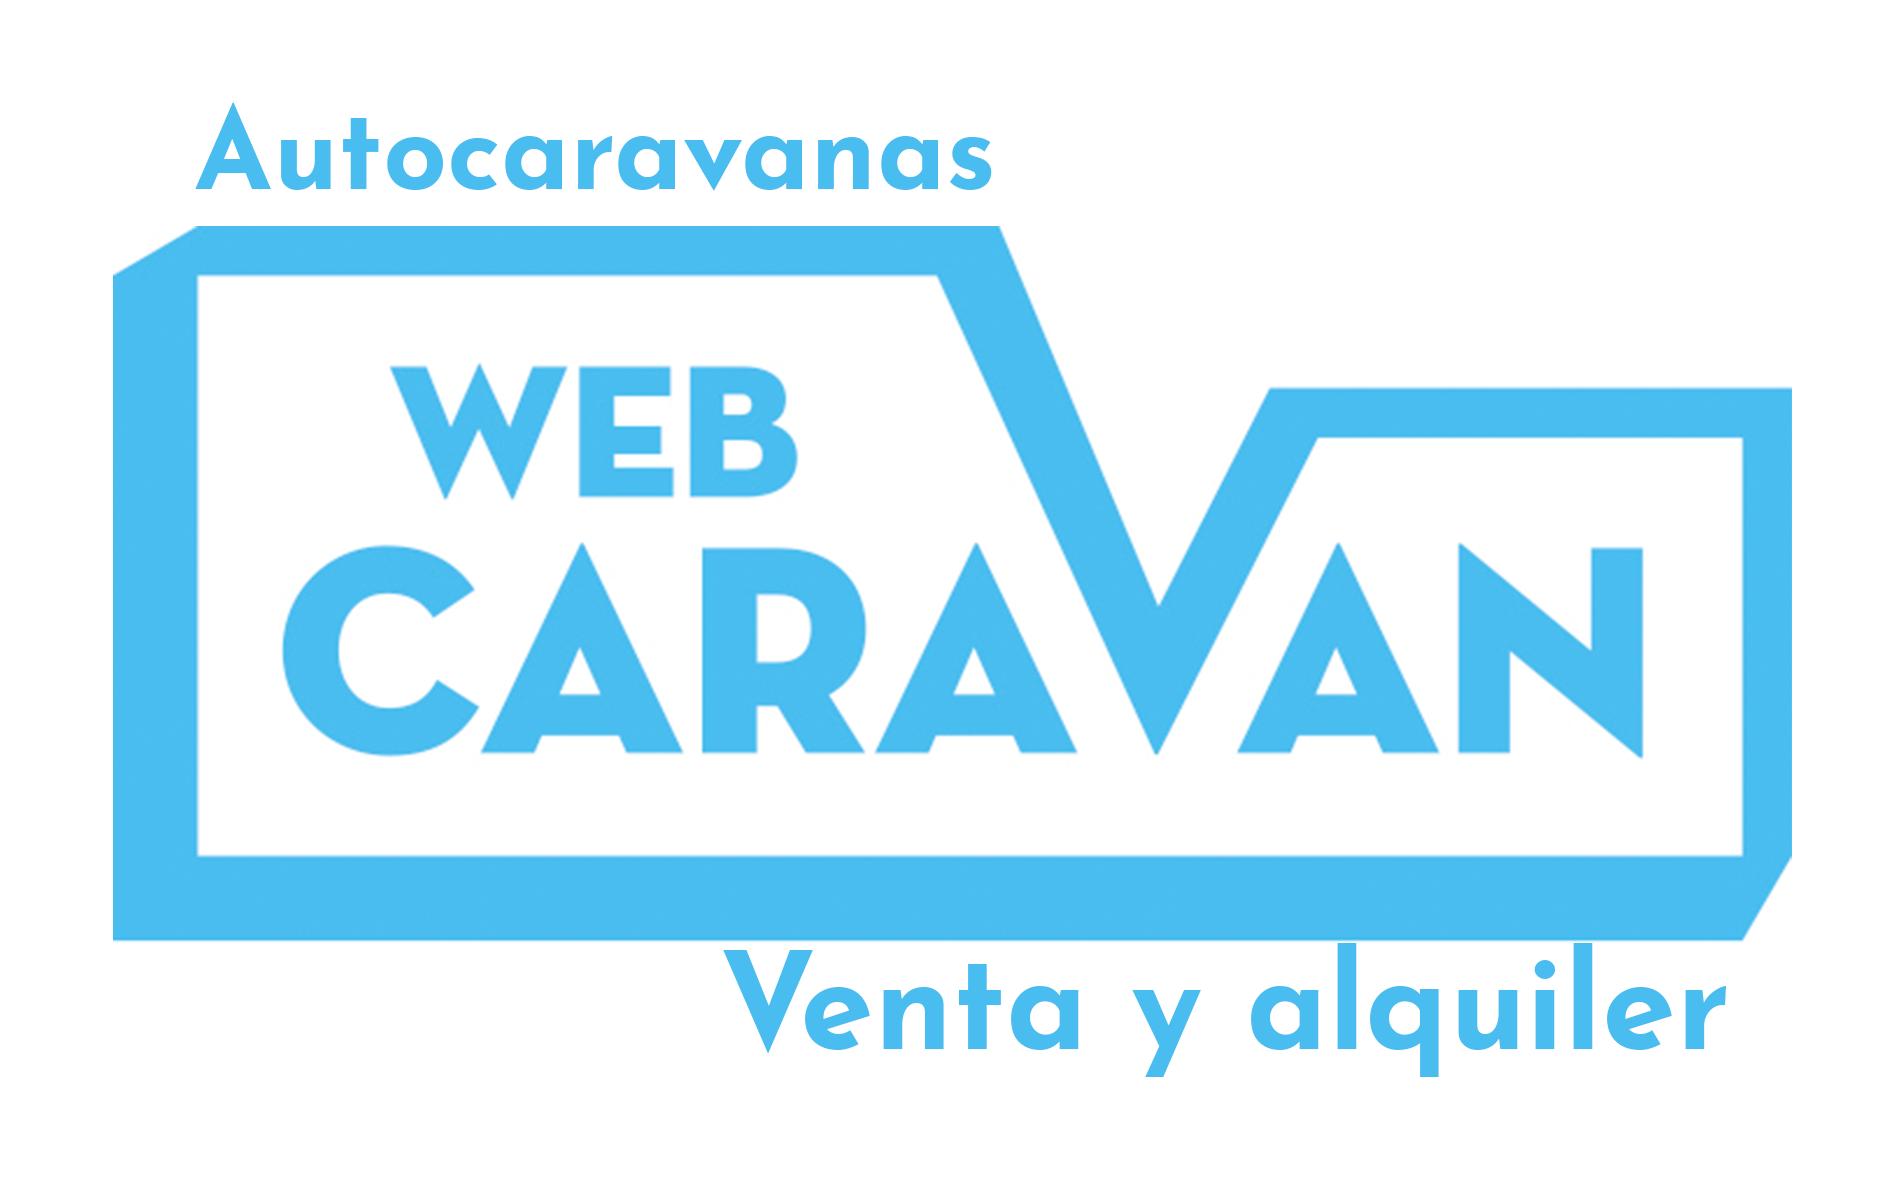 https://ev4doc.s3.eu-west-1.amazonaws.com/webcaravan/documentos/webcaravan/catalogo/9472/0138595ce86bec8e56081184b7ab031c.png